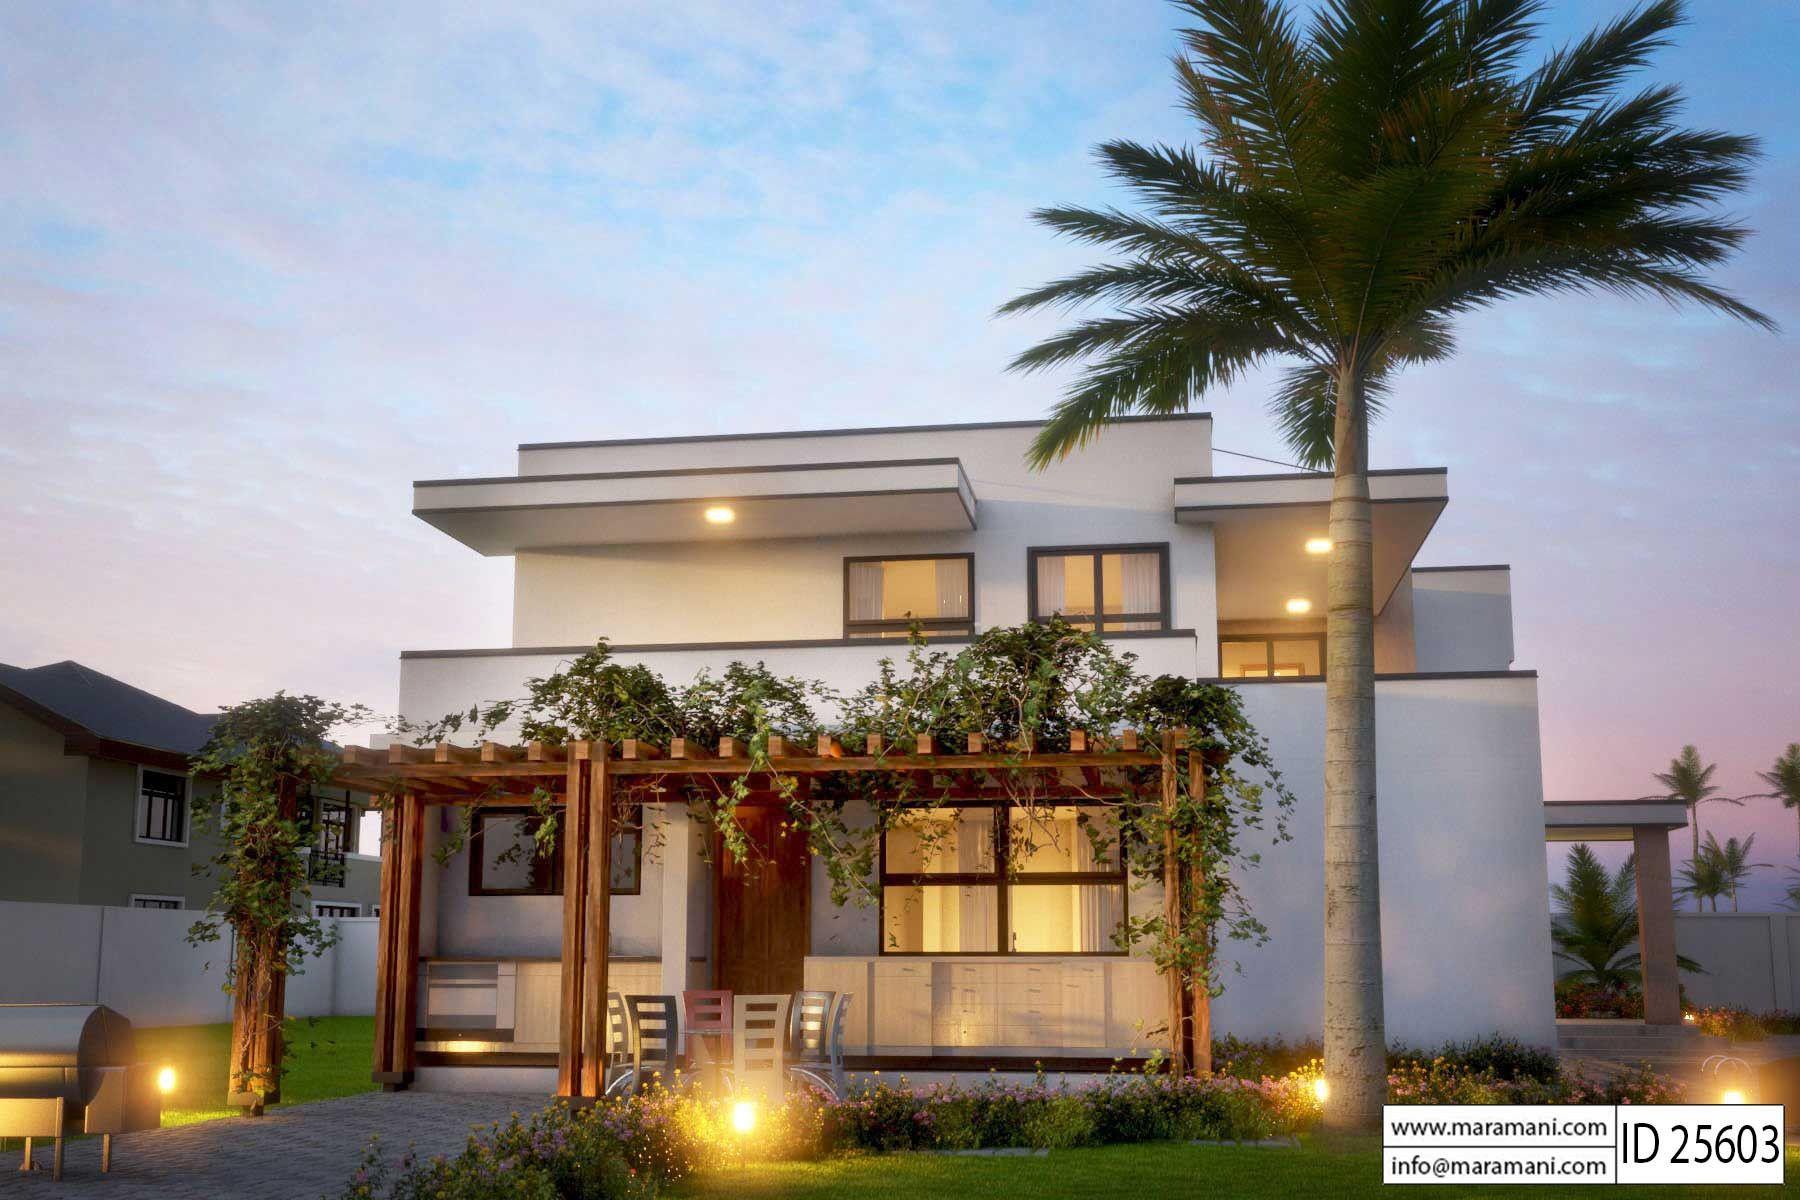 Modern 5 Bedroom House Design Id 25603 Floor Plans By Maramani 5 Bedroom House Plans Contemporary House Plans Farmhouse Plans